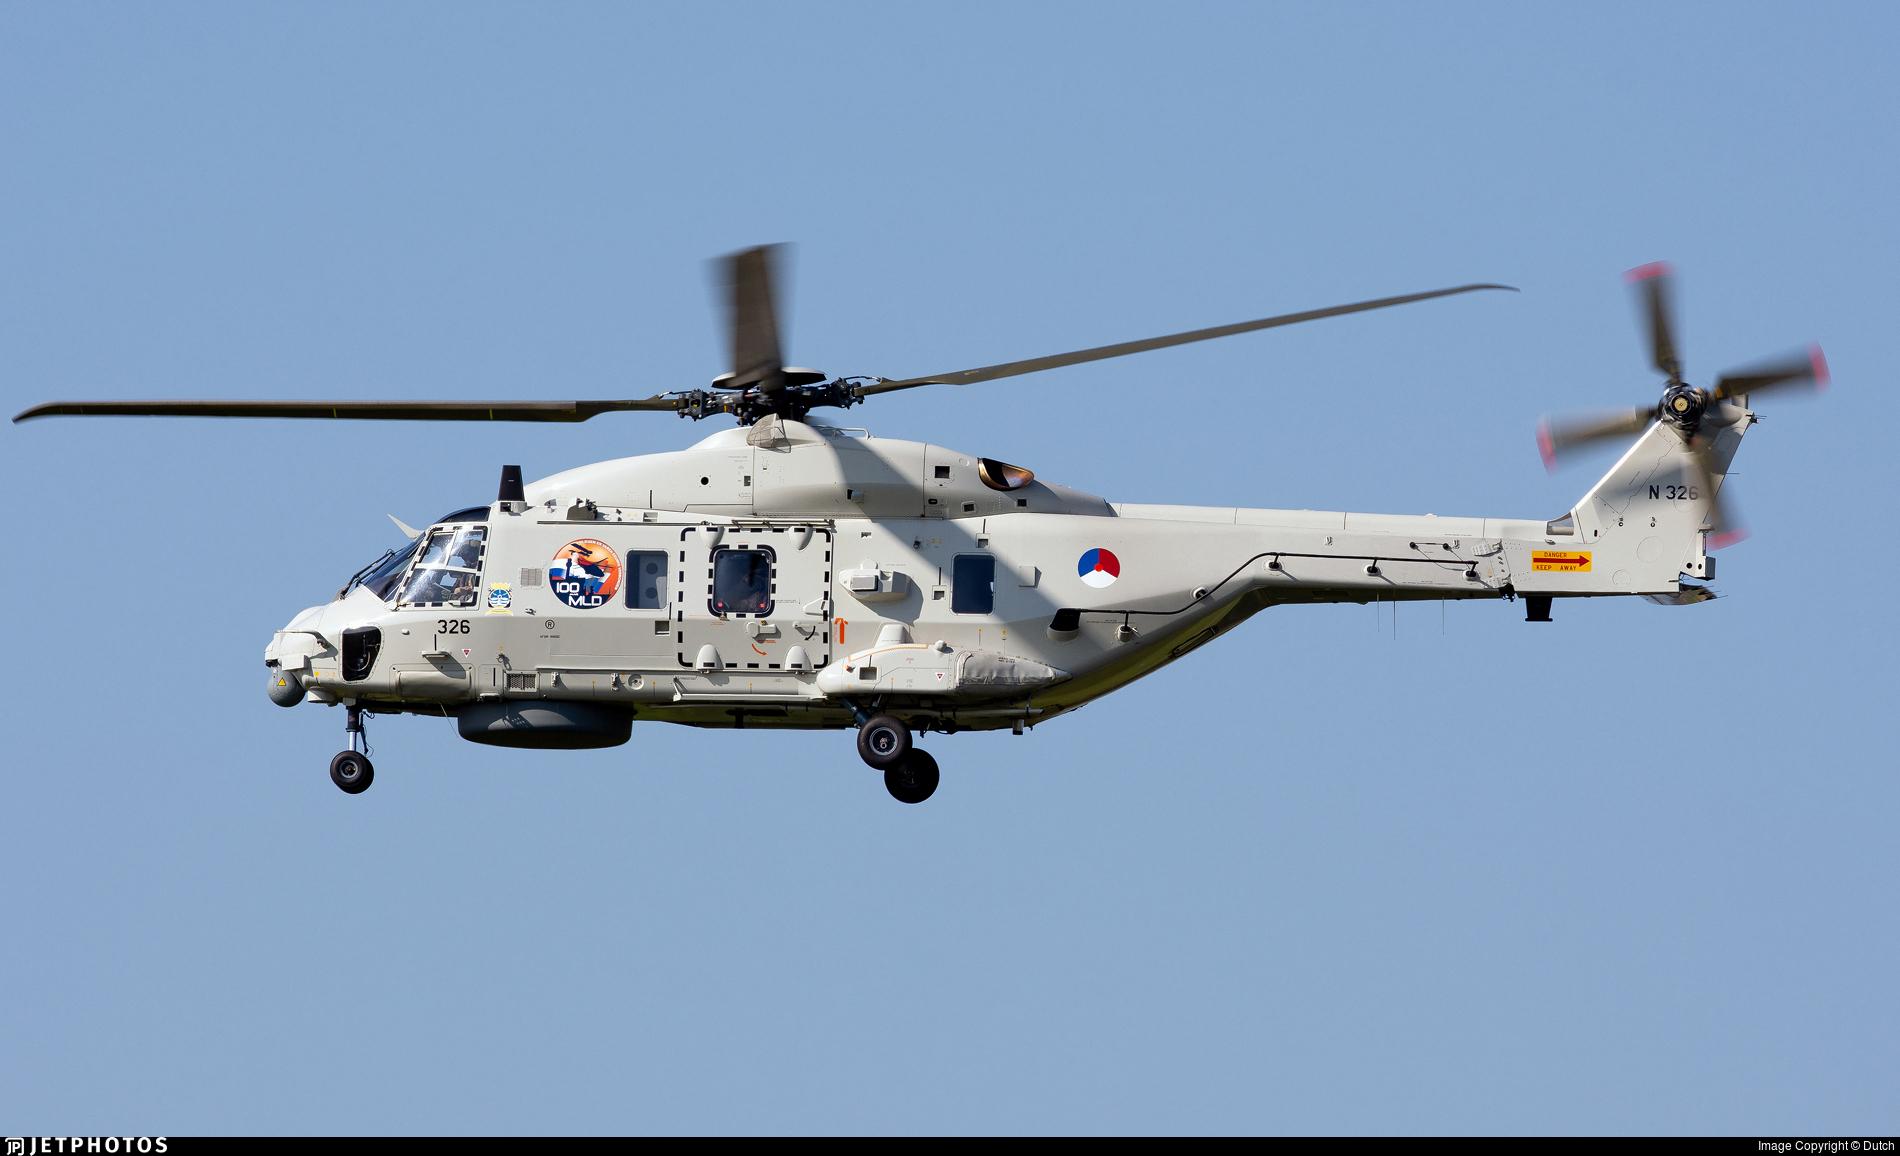 N-326 - NH Industries NH-90NFH - Netherlands - Navy